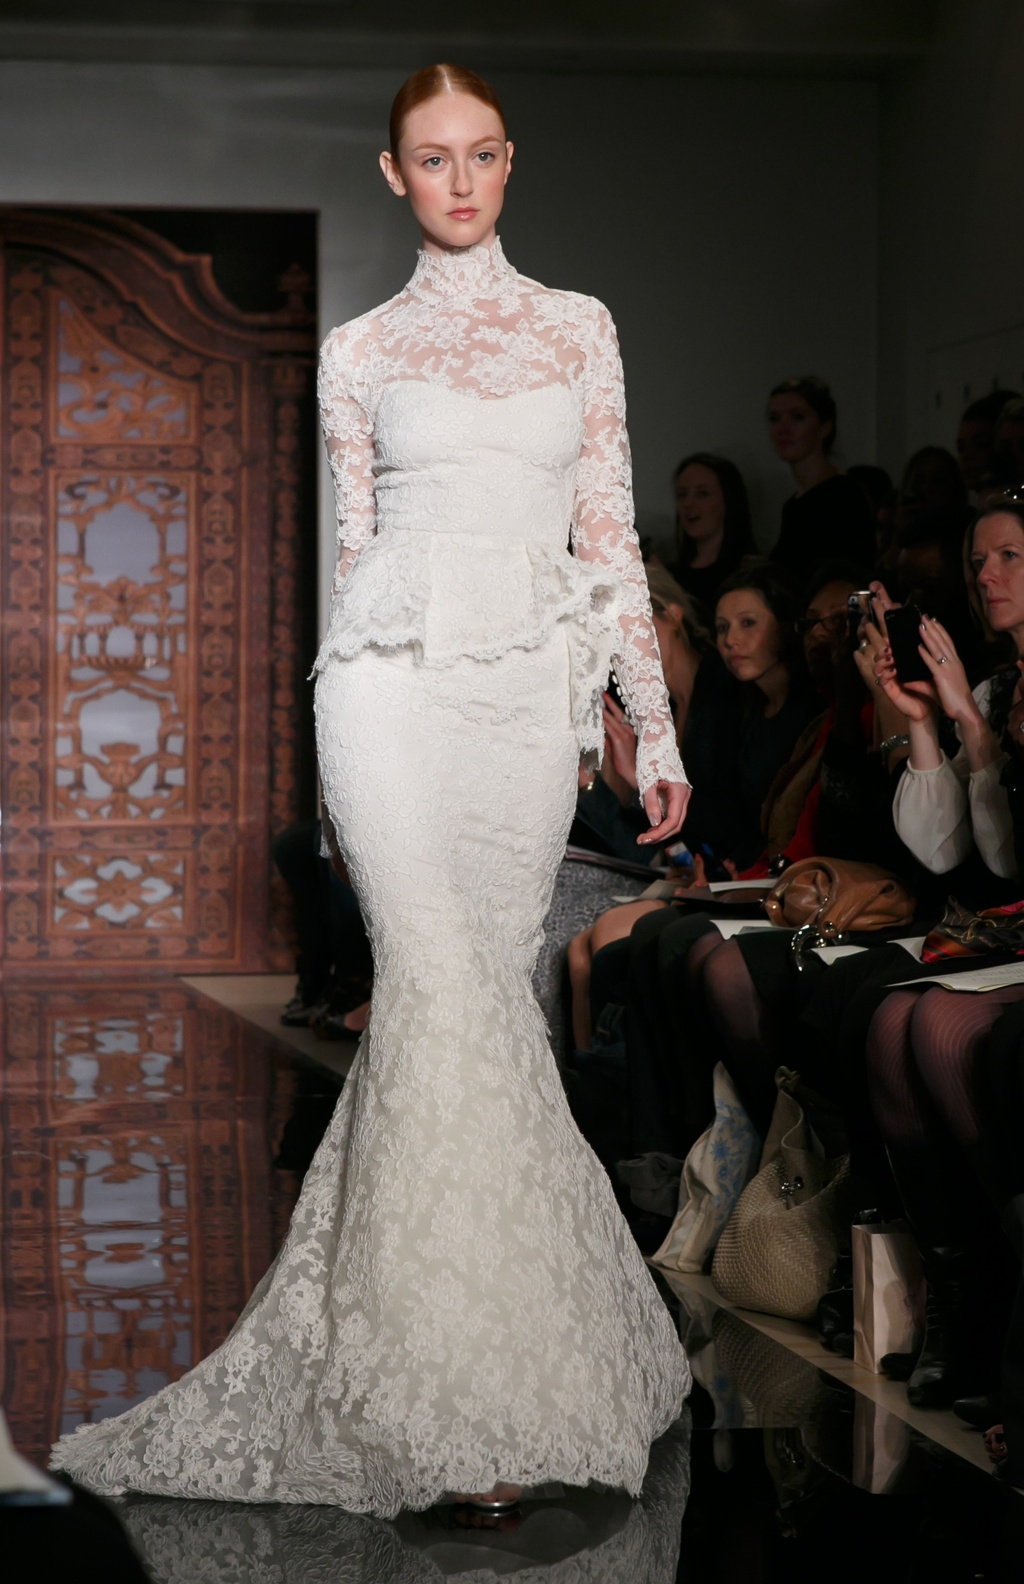 Reem-acra-wedding-dress-fall-2013-bridal-frances-alluring-beauty-lace-peplum-f.full